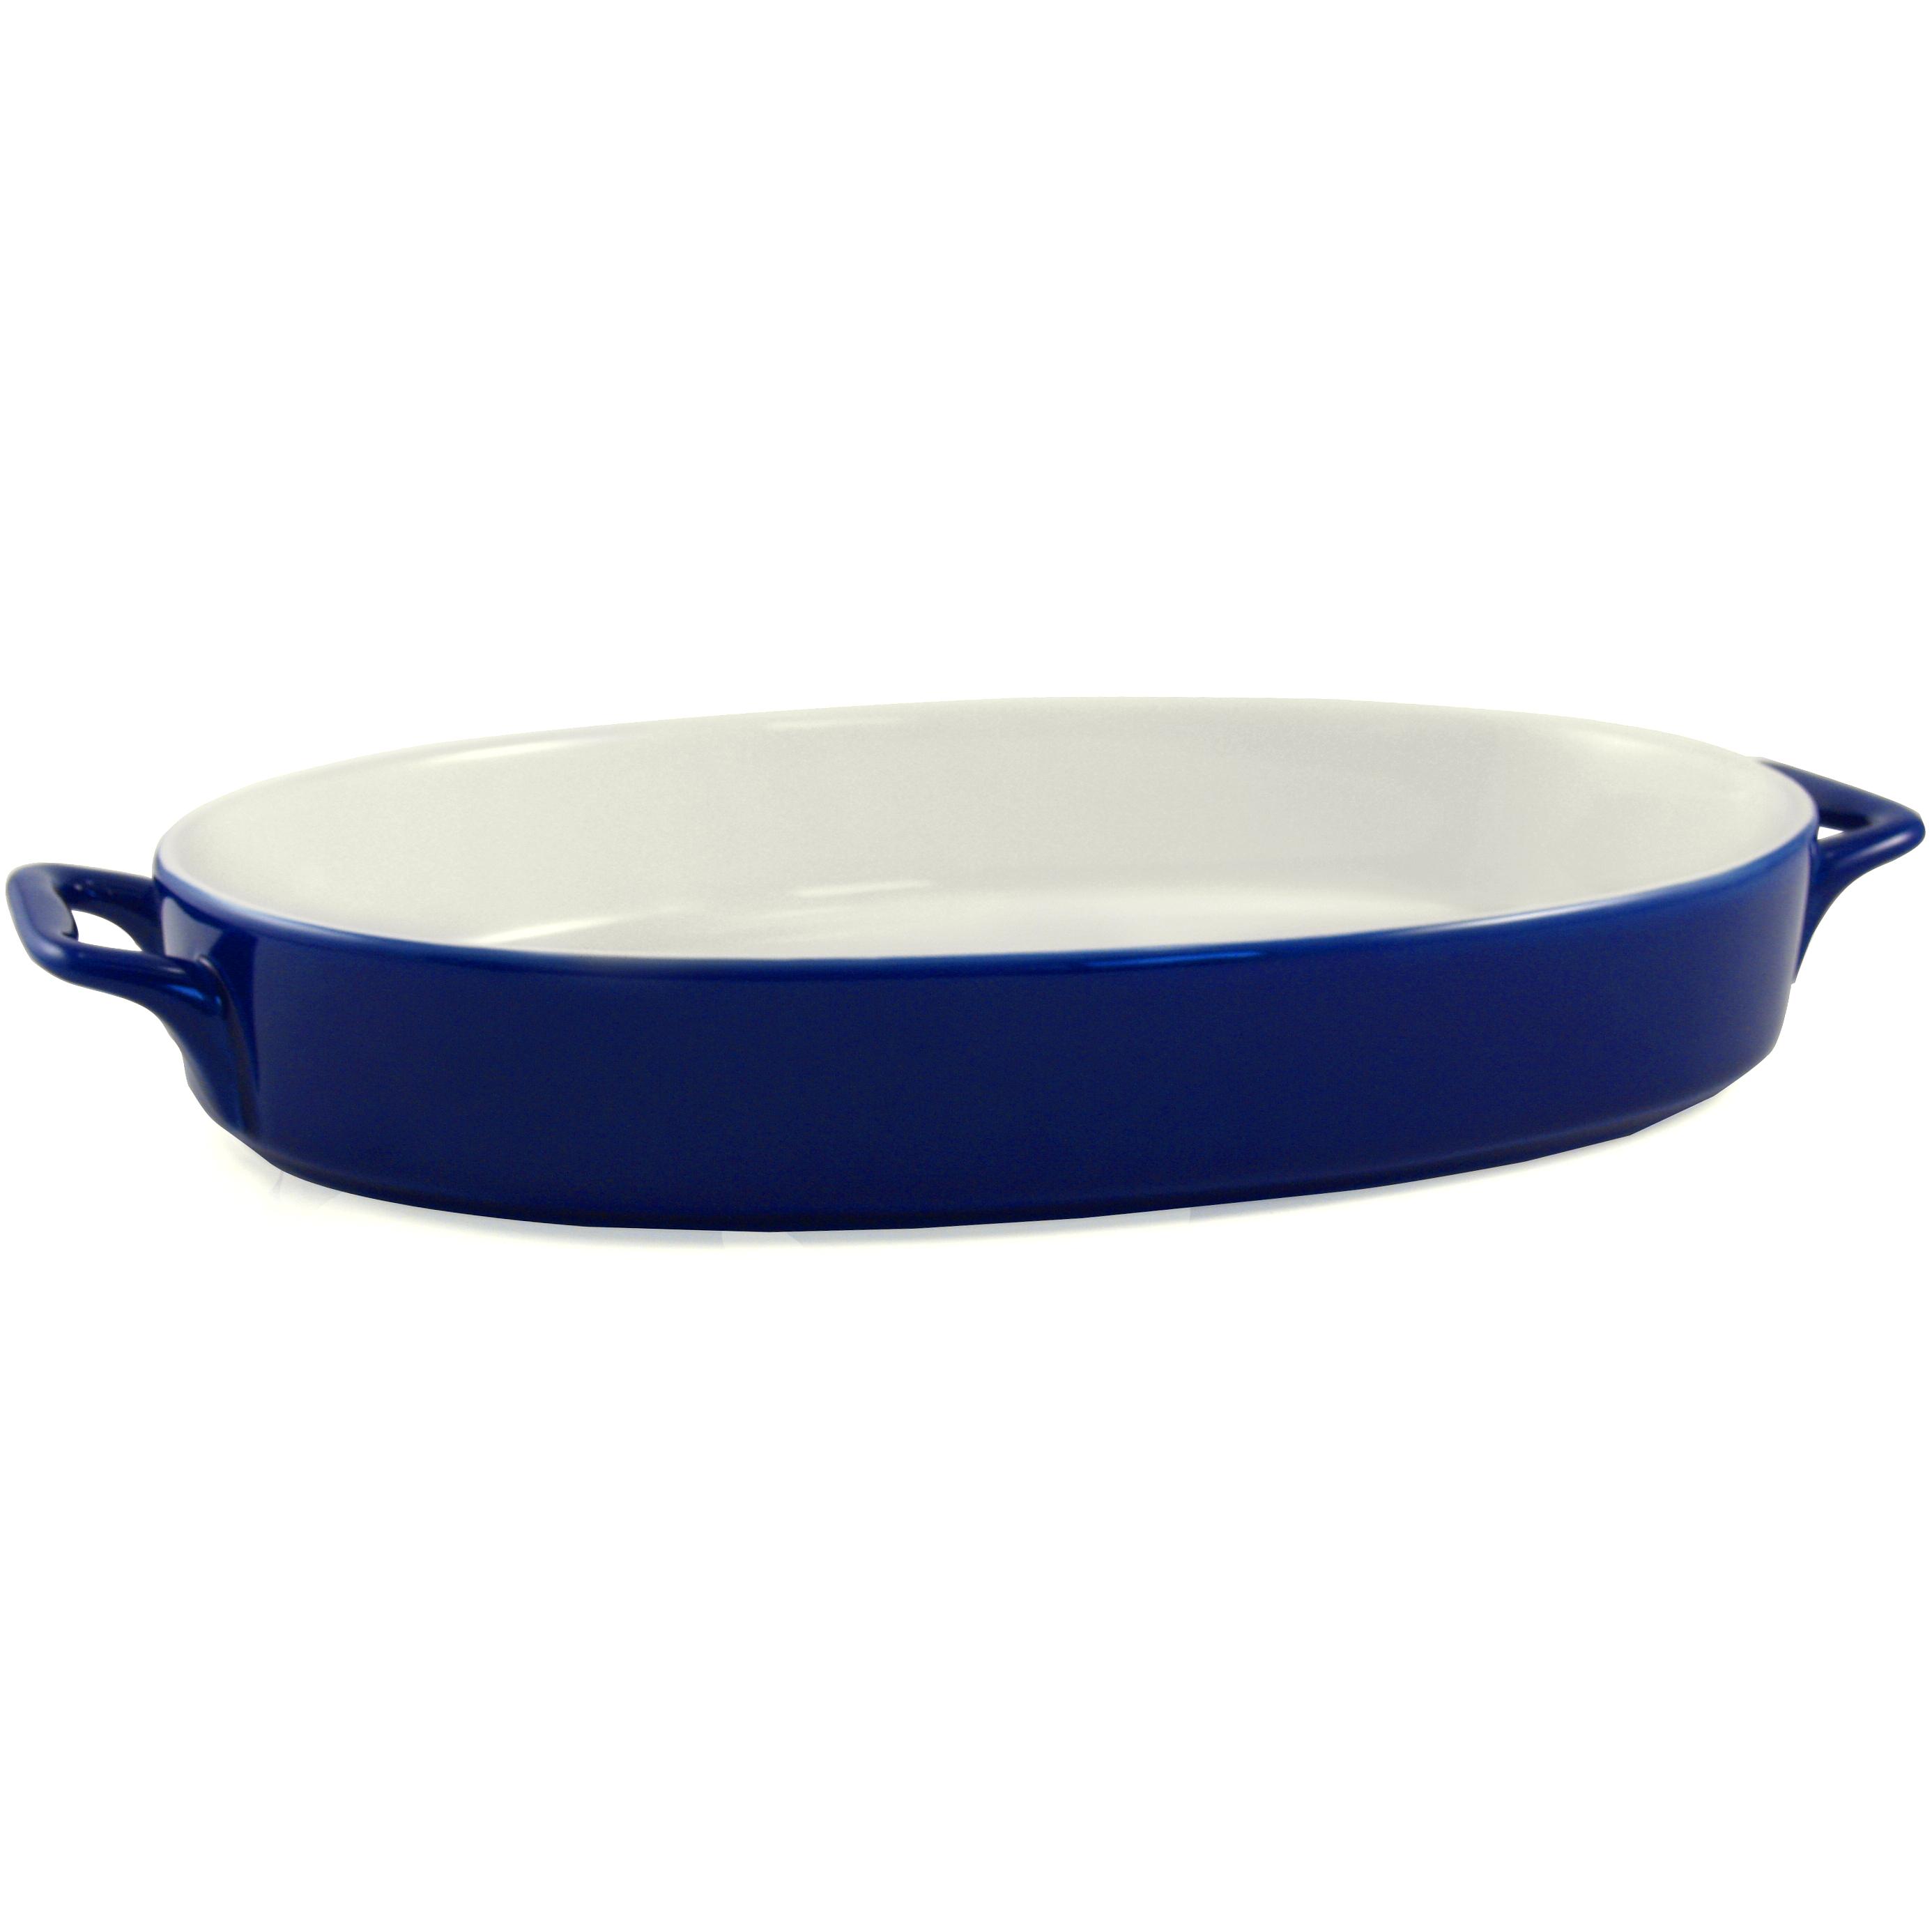 Blue Ceramic 14 Inch Oval Baker